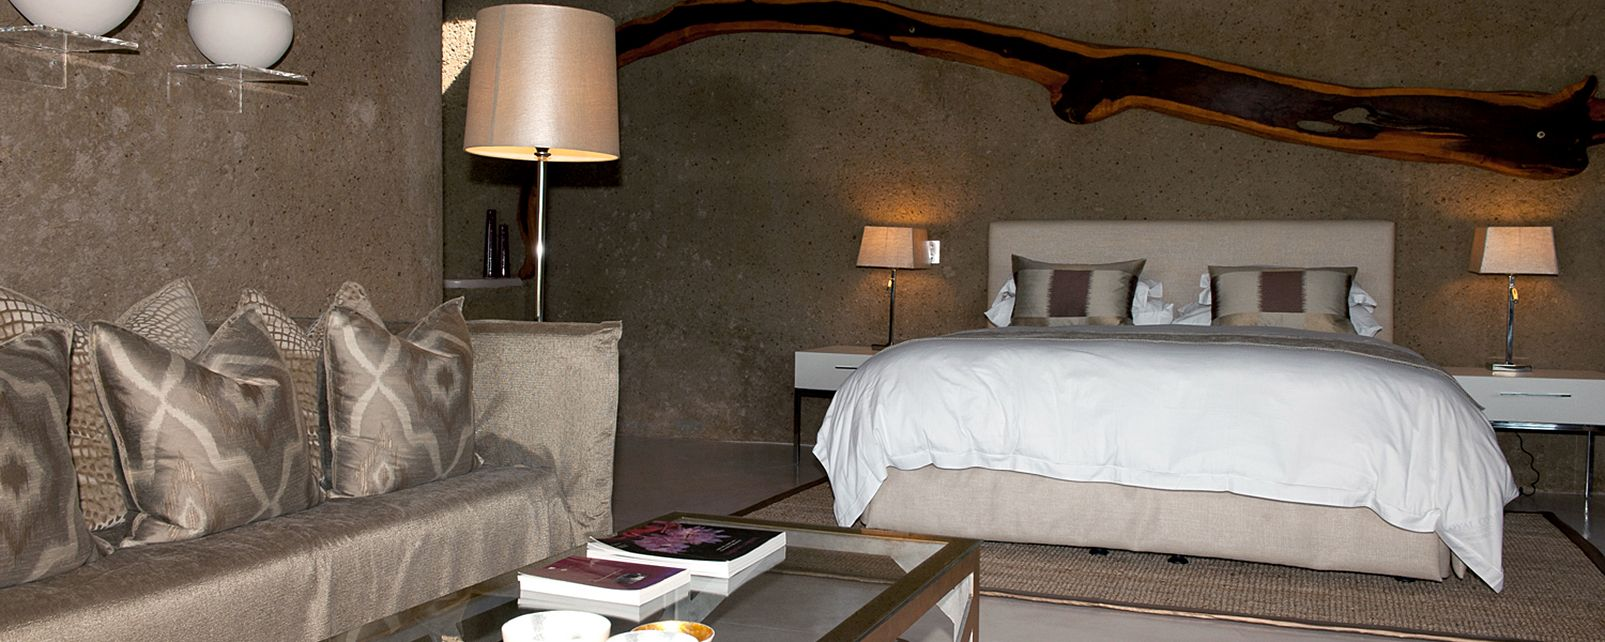 Hotel  Sabi Sabi Earth Lodge